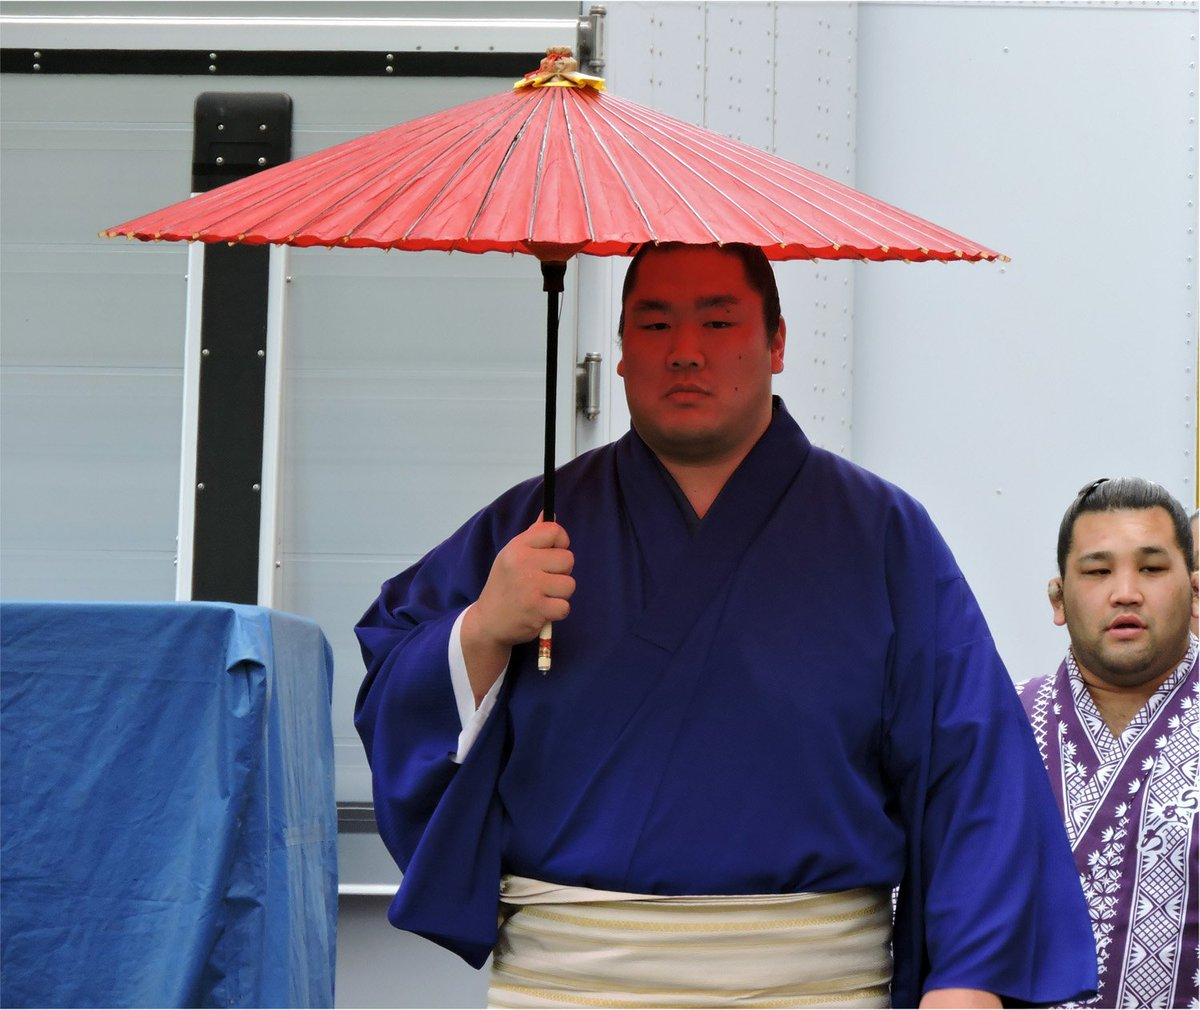 test ツイッターメディア - 輝関と・・・途中で傘をたたんだ琴奨菊関 https://t.co/3lZp76pyuT